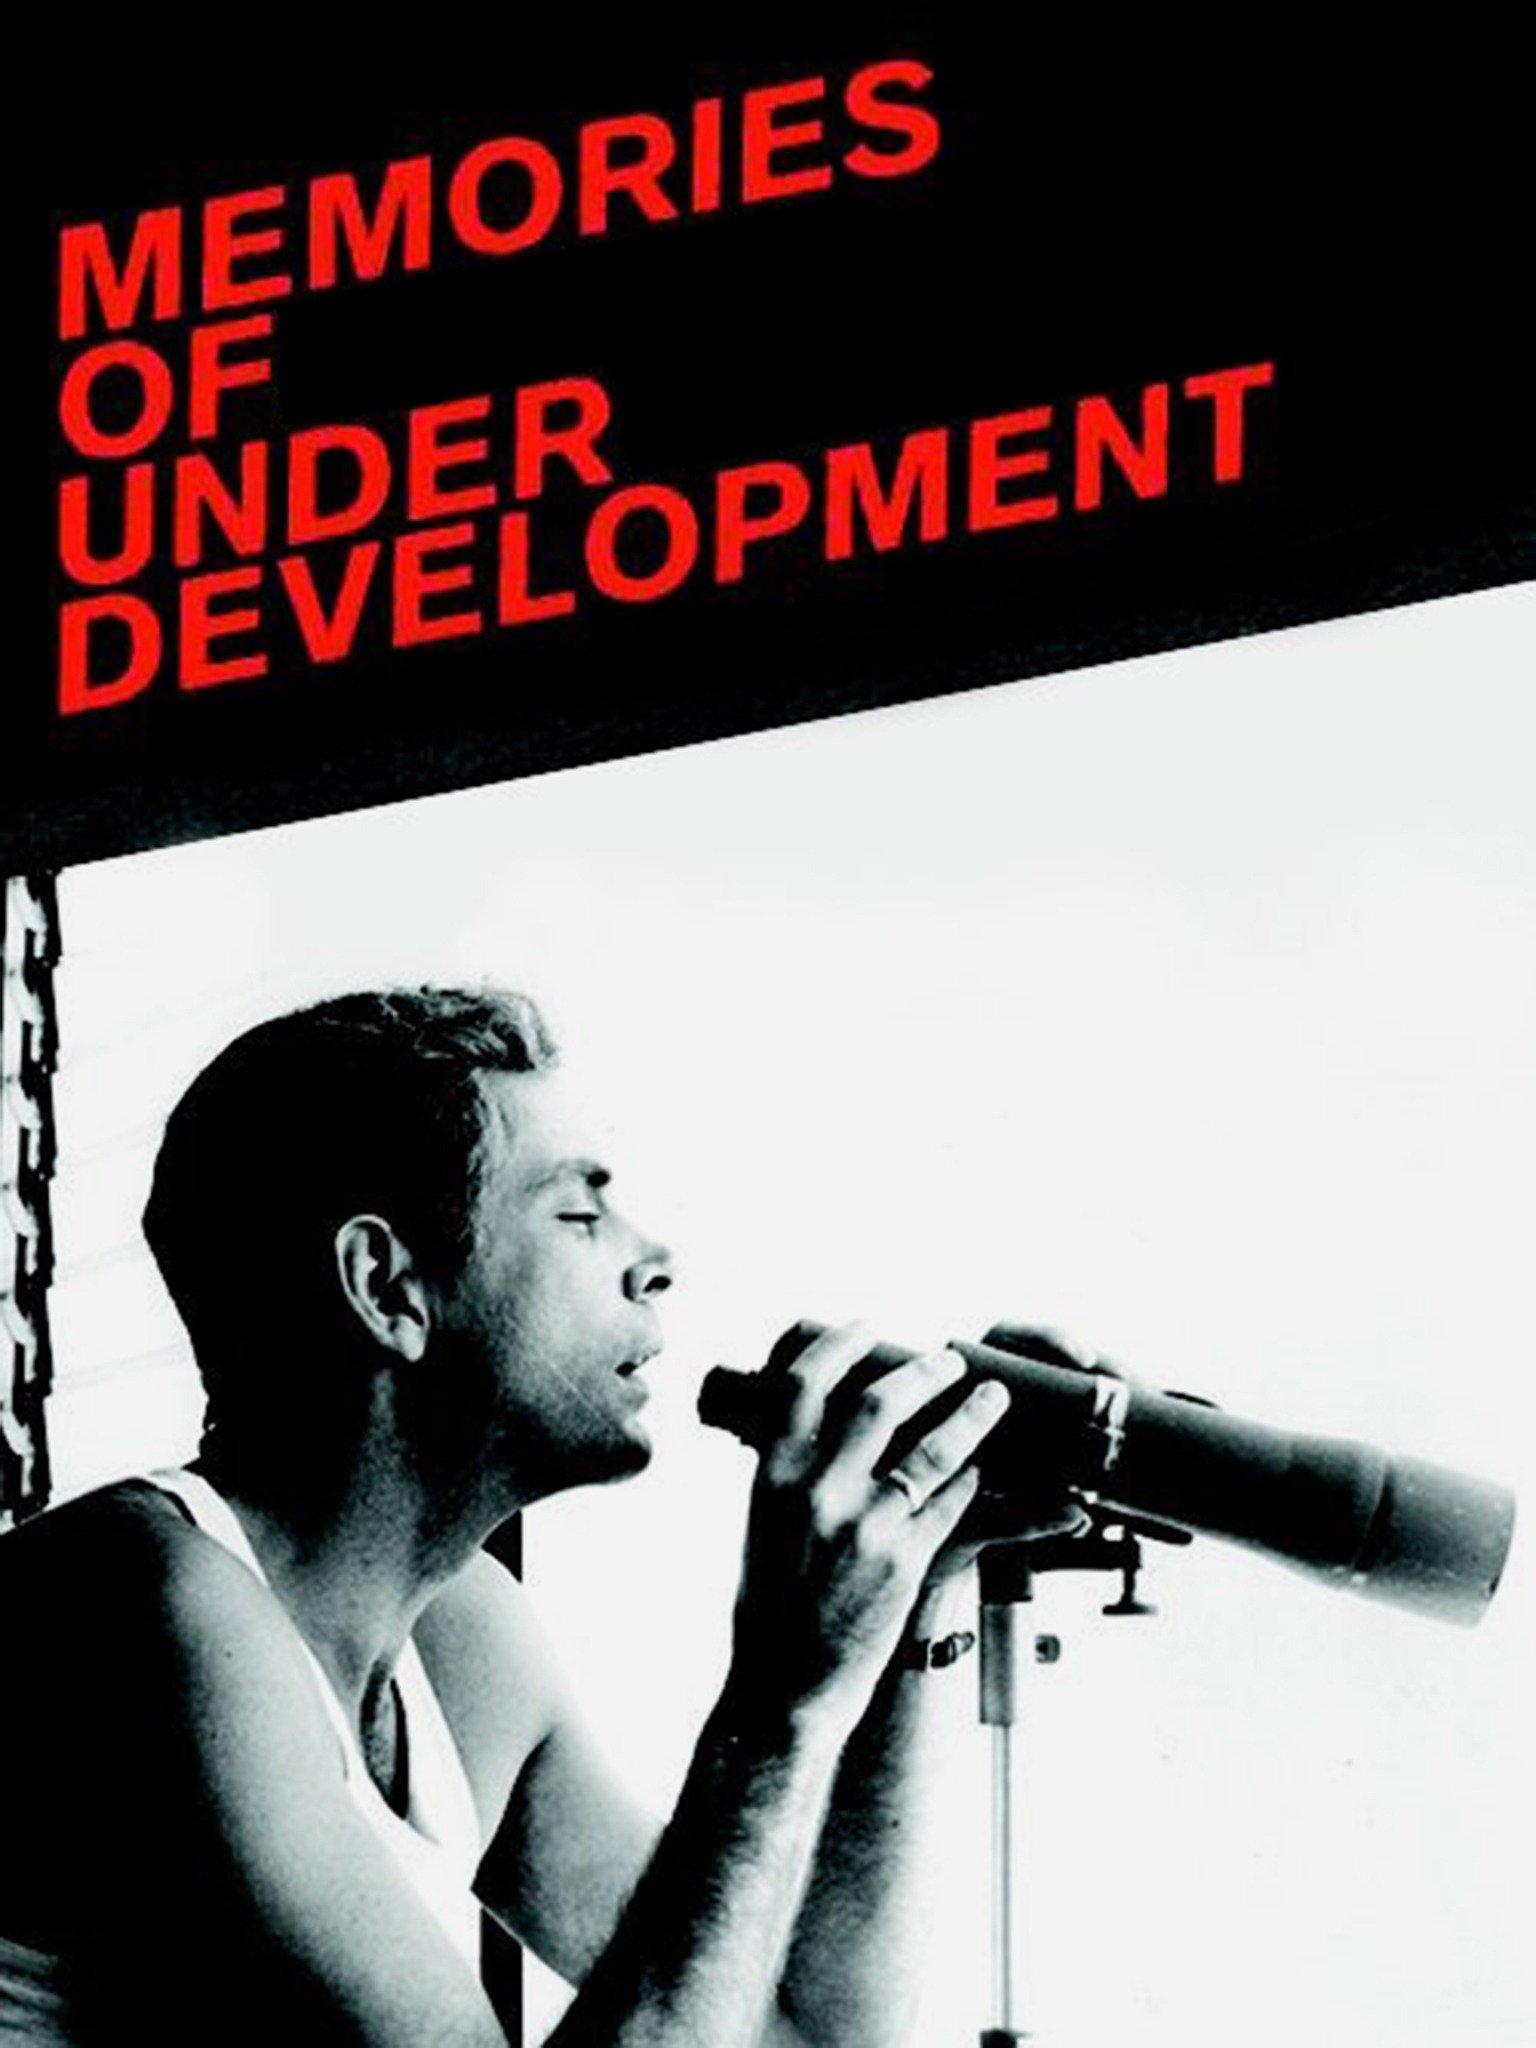 Memories of Underdevelopment (Memorias del subdesarrollo)